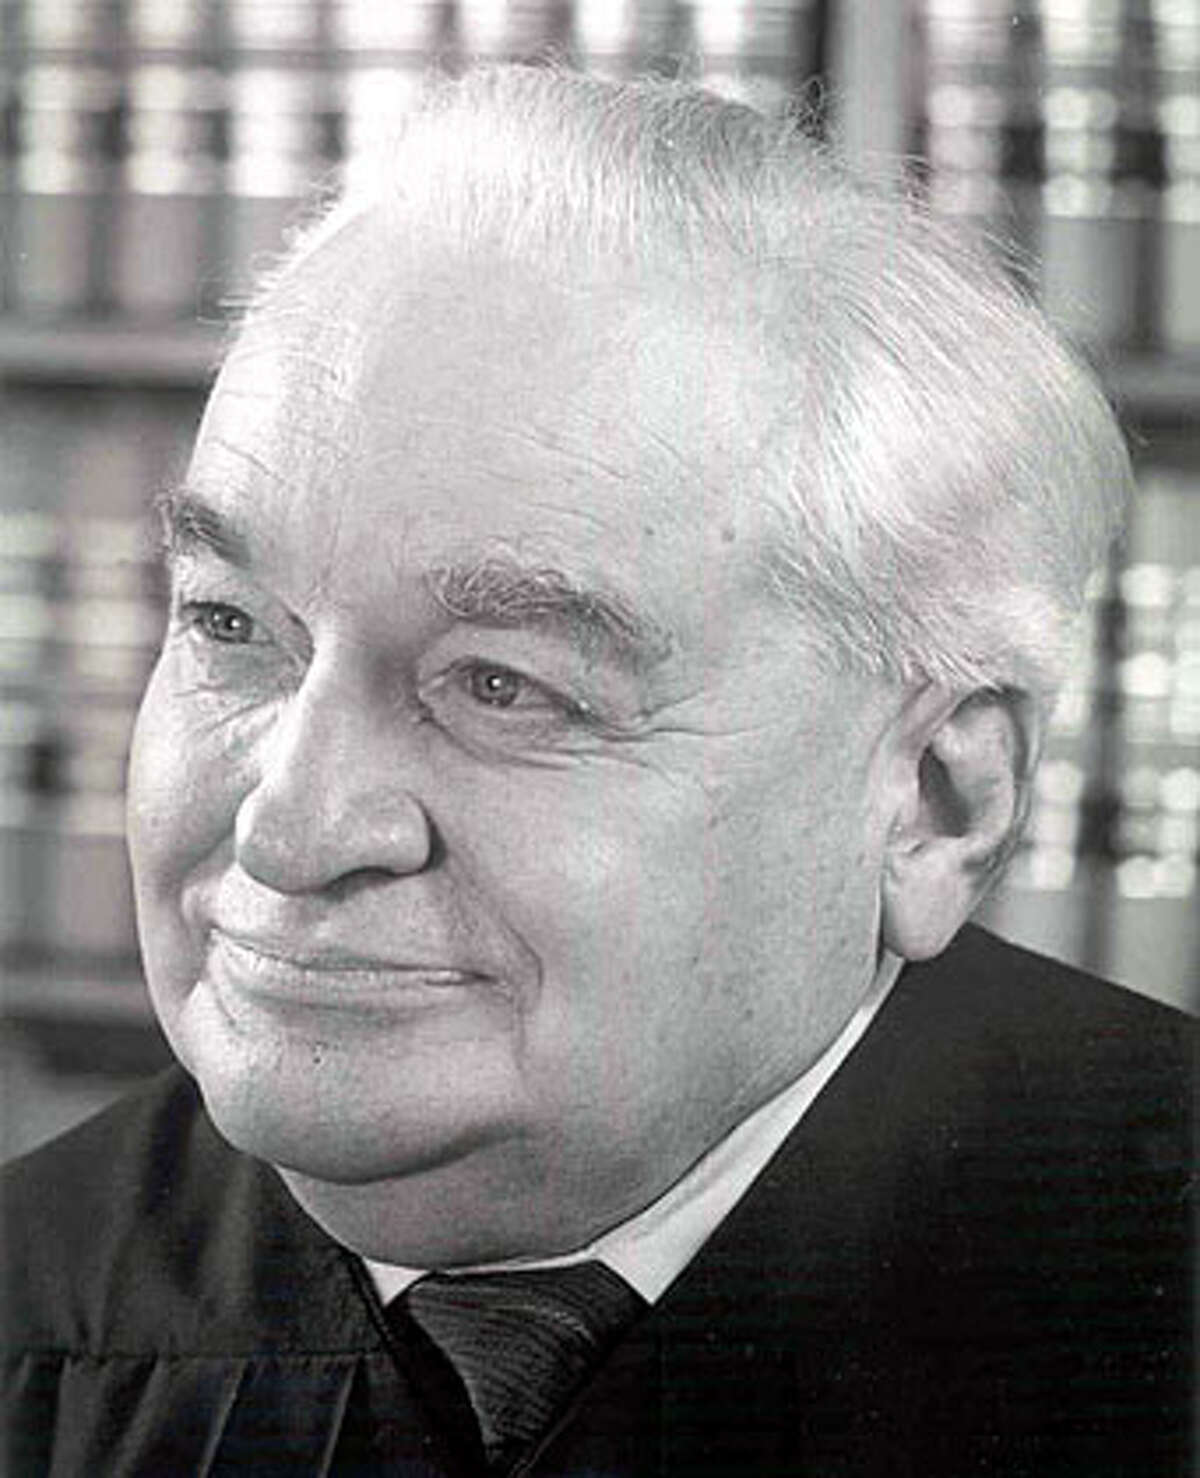 obit photo of Joseph Sneed